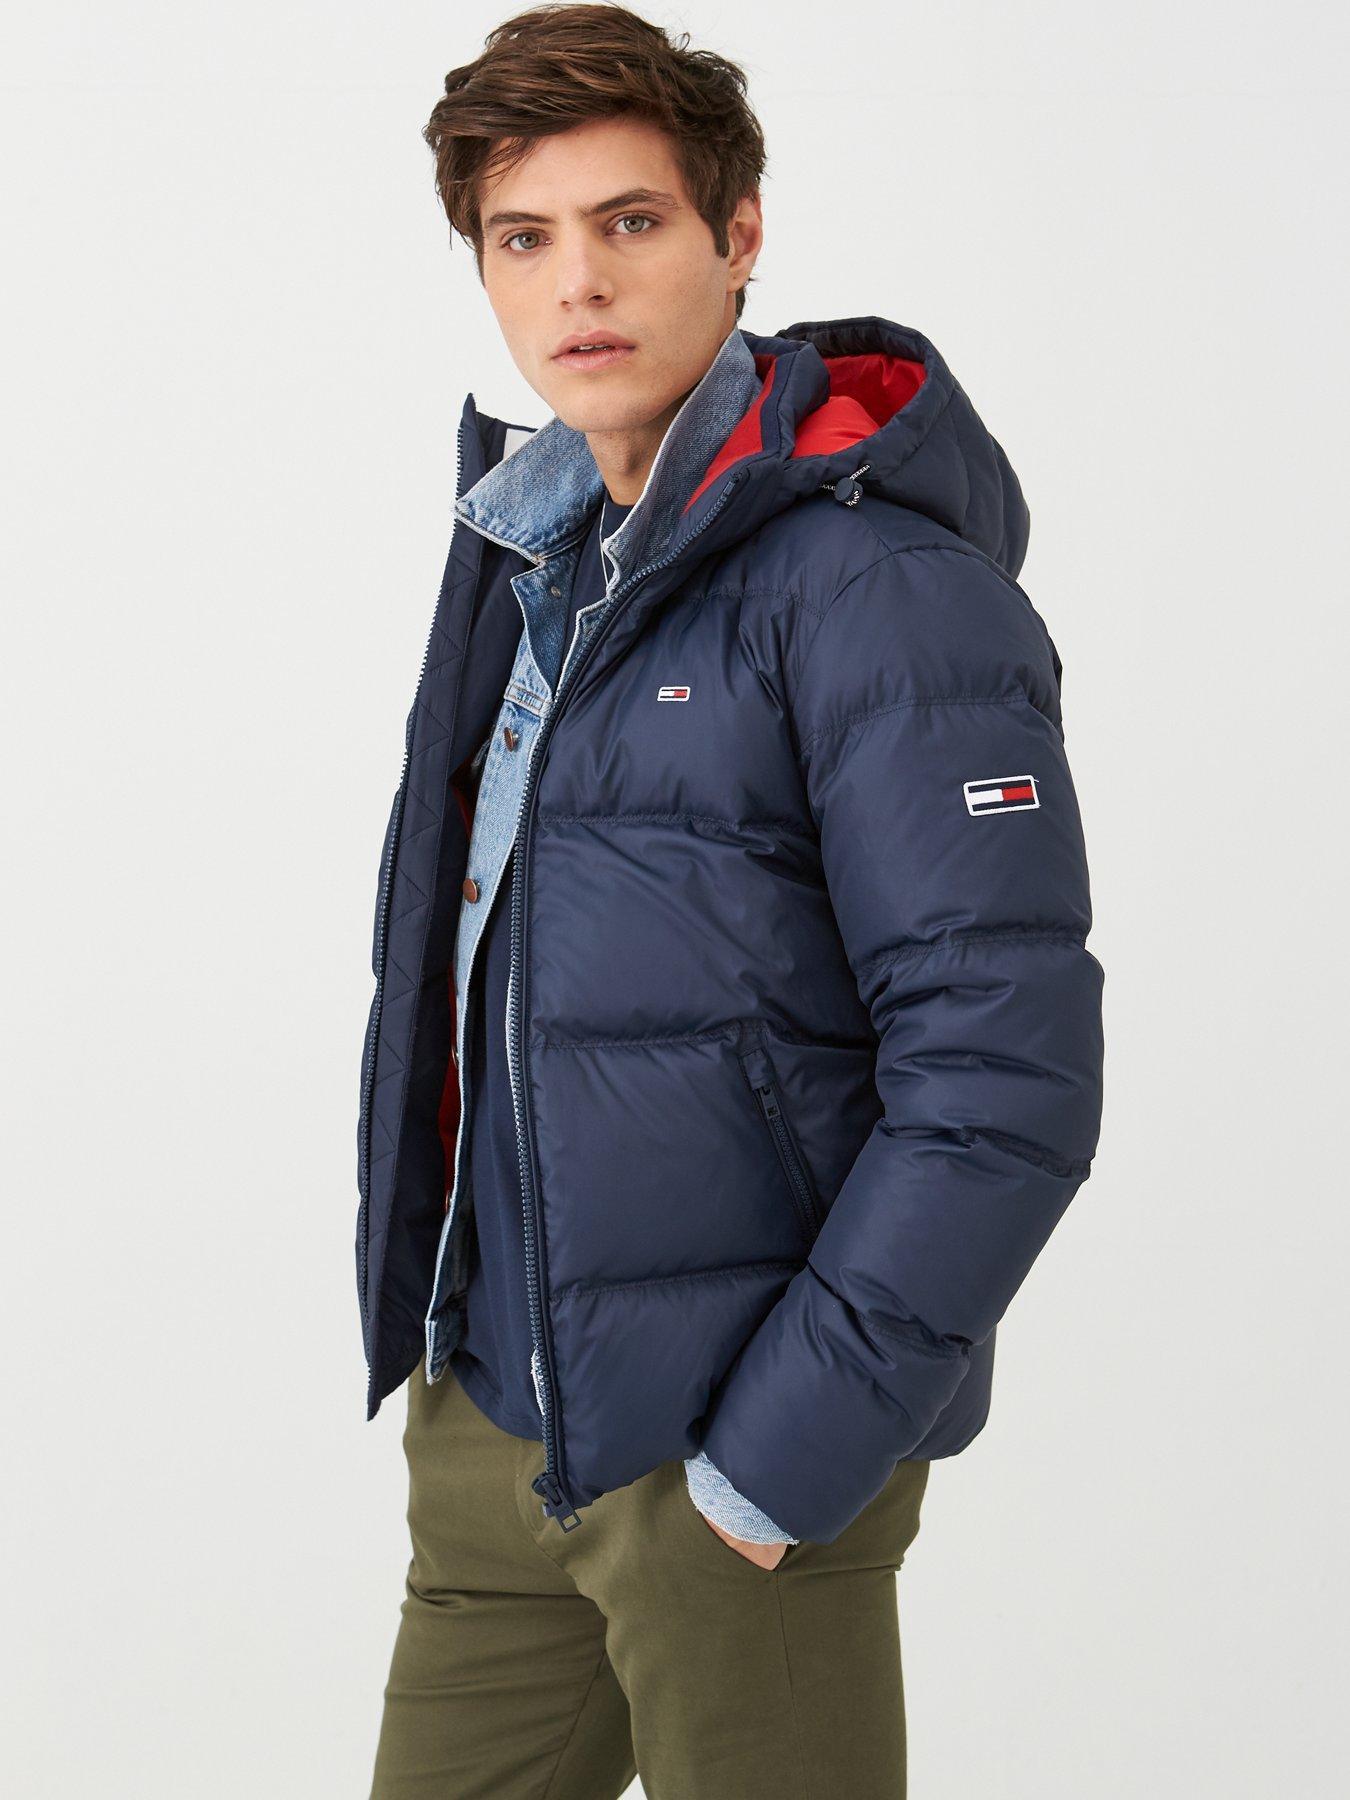 Tommy hilfiger | Coats & jackets | Men | very.co.uk